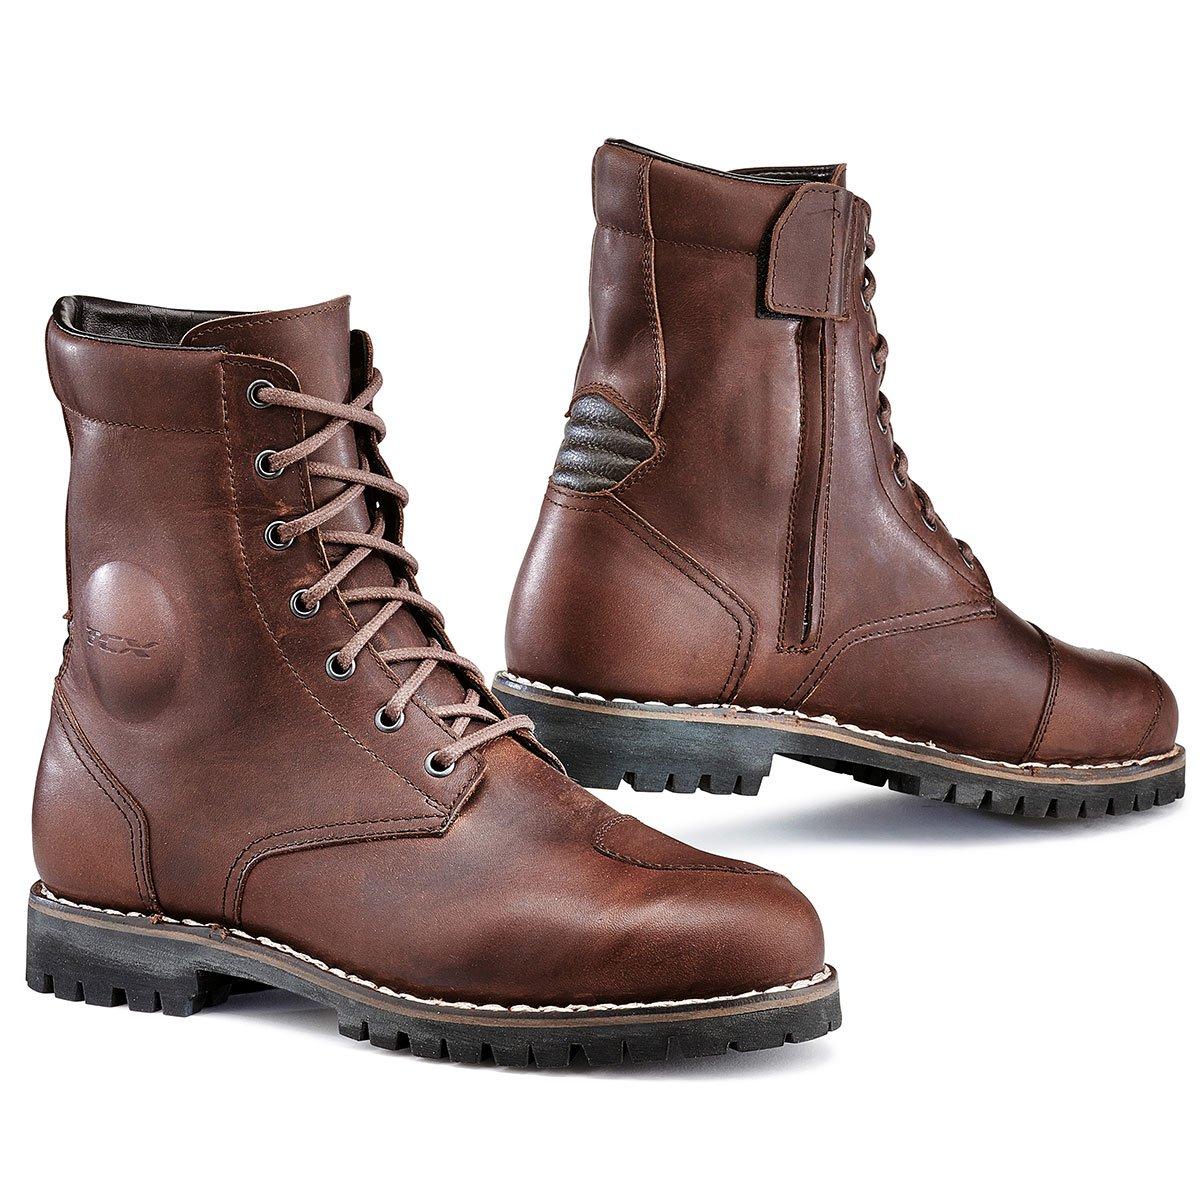 TCX Hero Boots (EU 39 / US 6) (Vintage Brown) by TCX